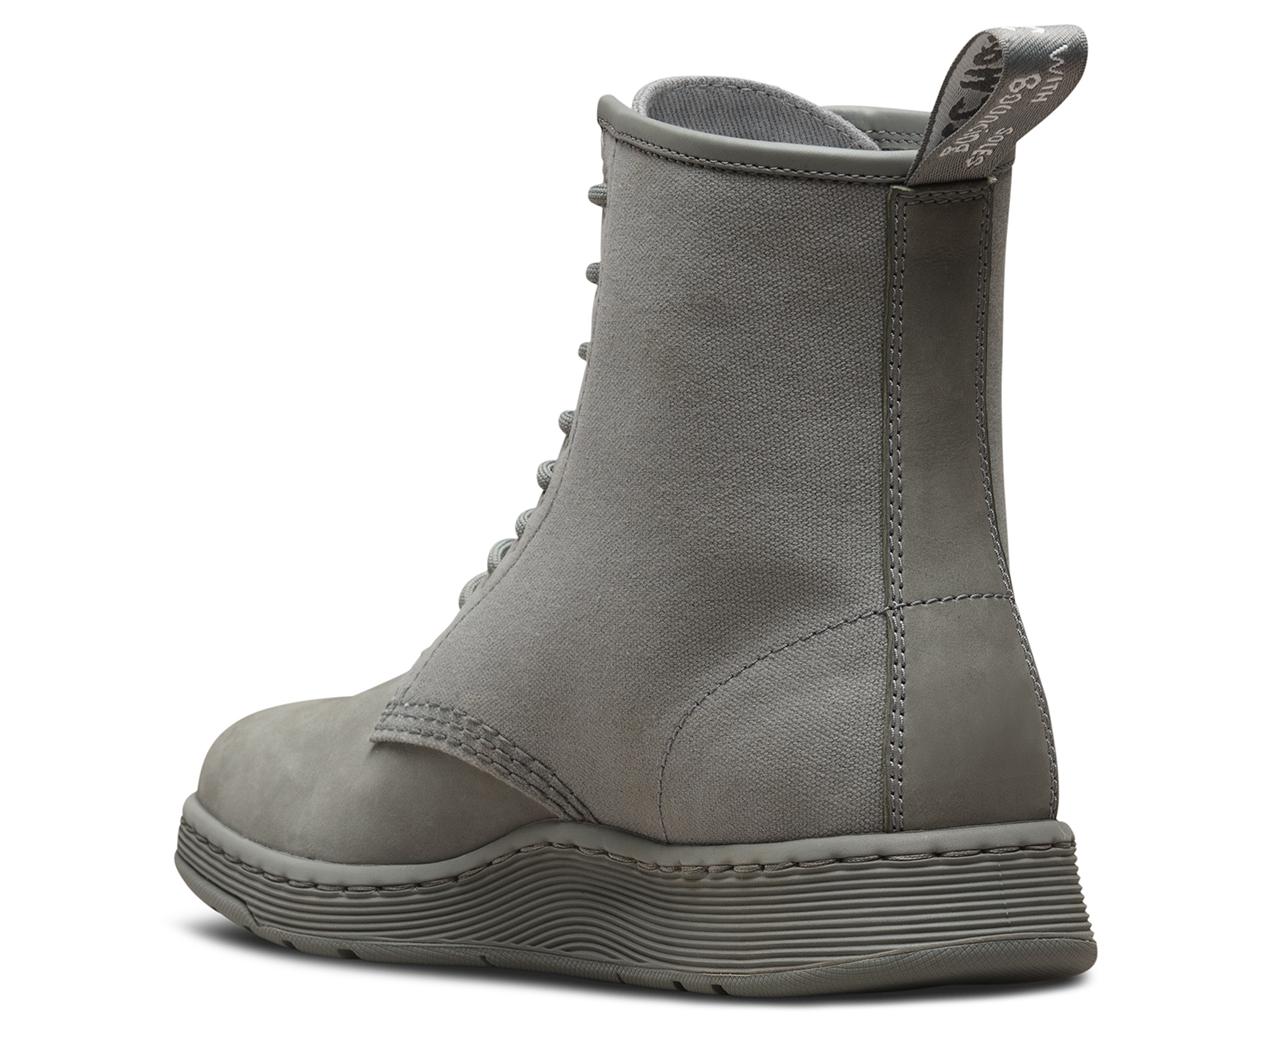 Dr. Martens Mens Newton Kaya Nubuck Canvas Boots*